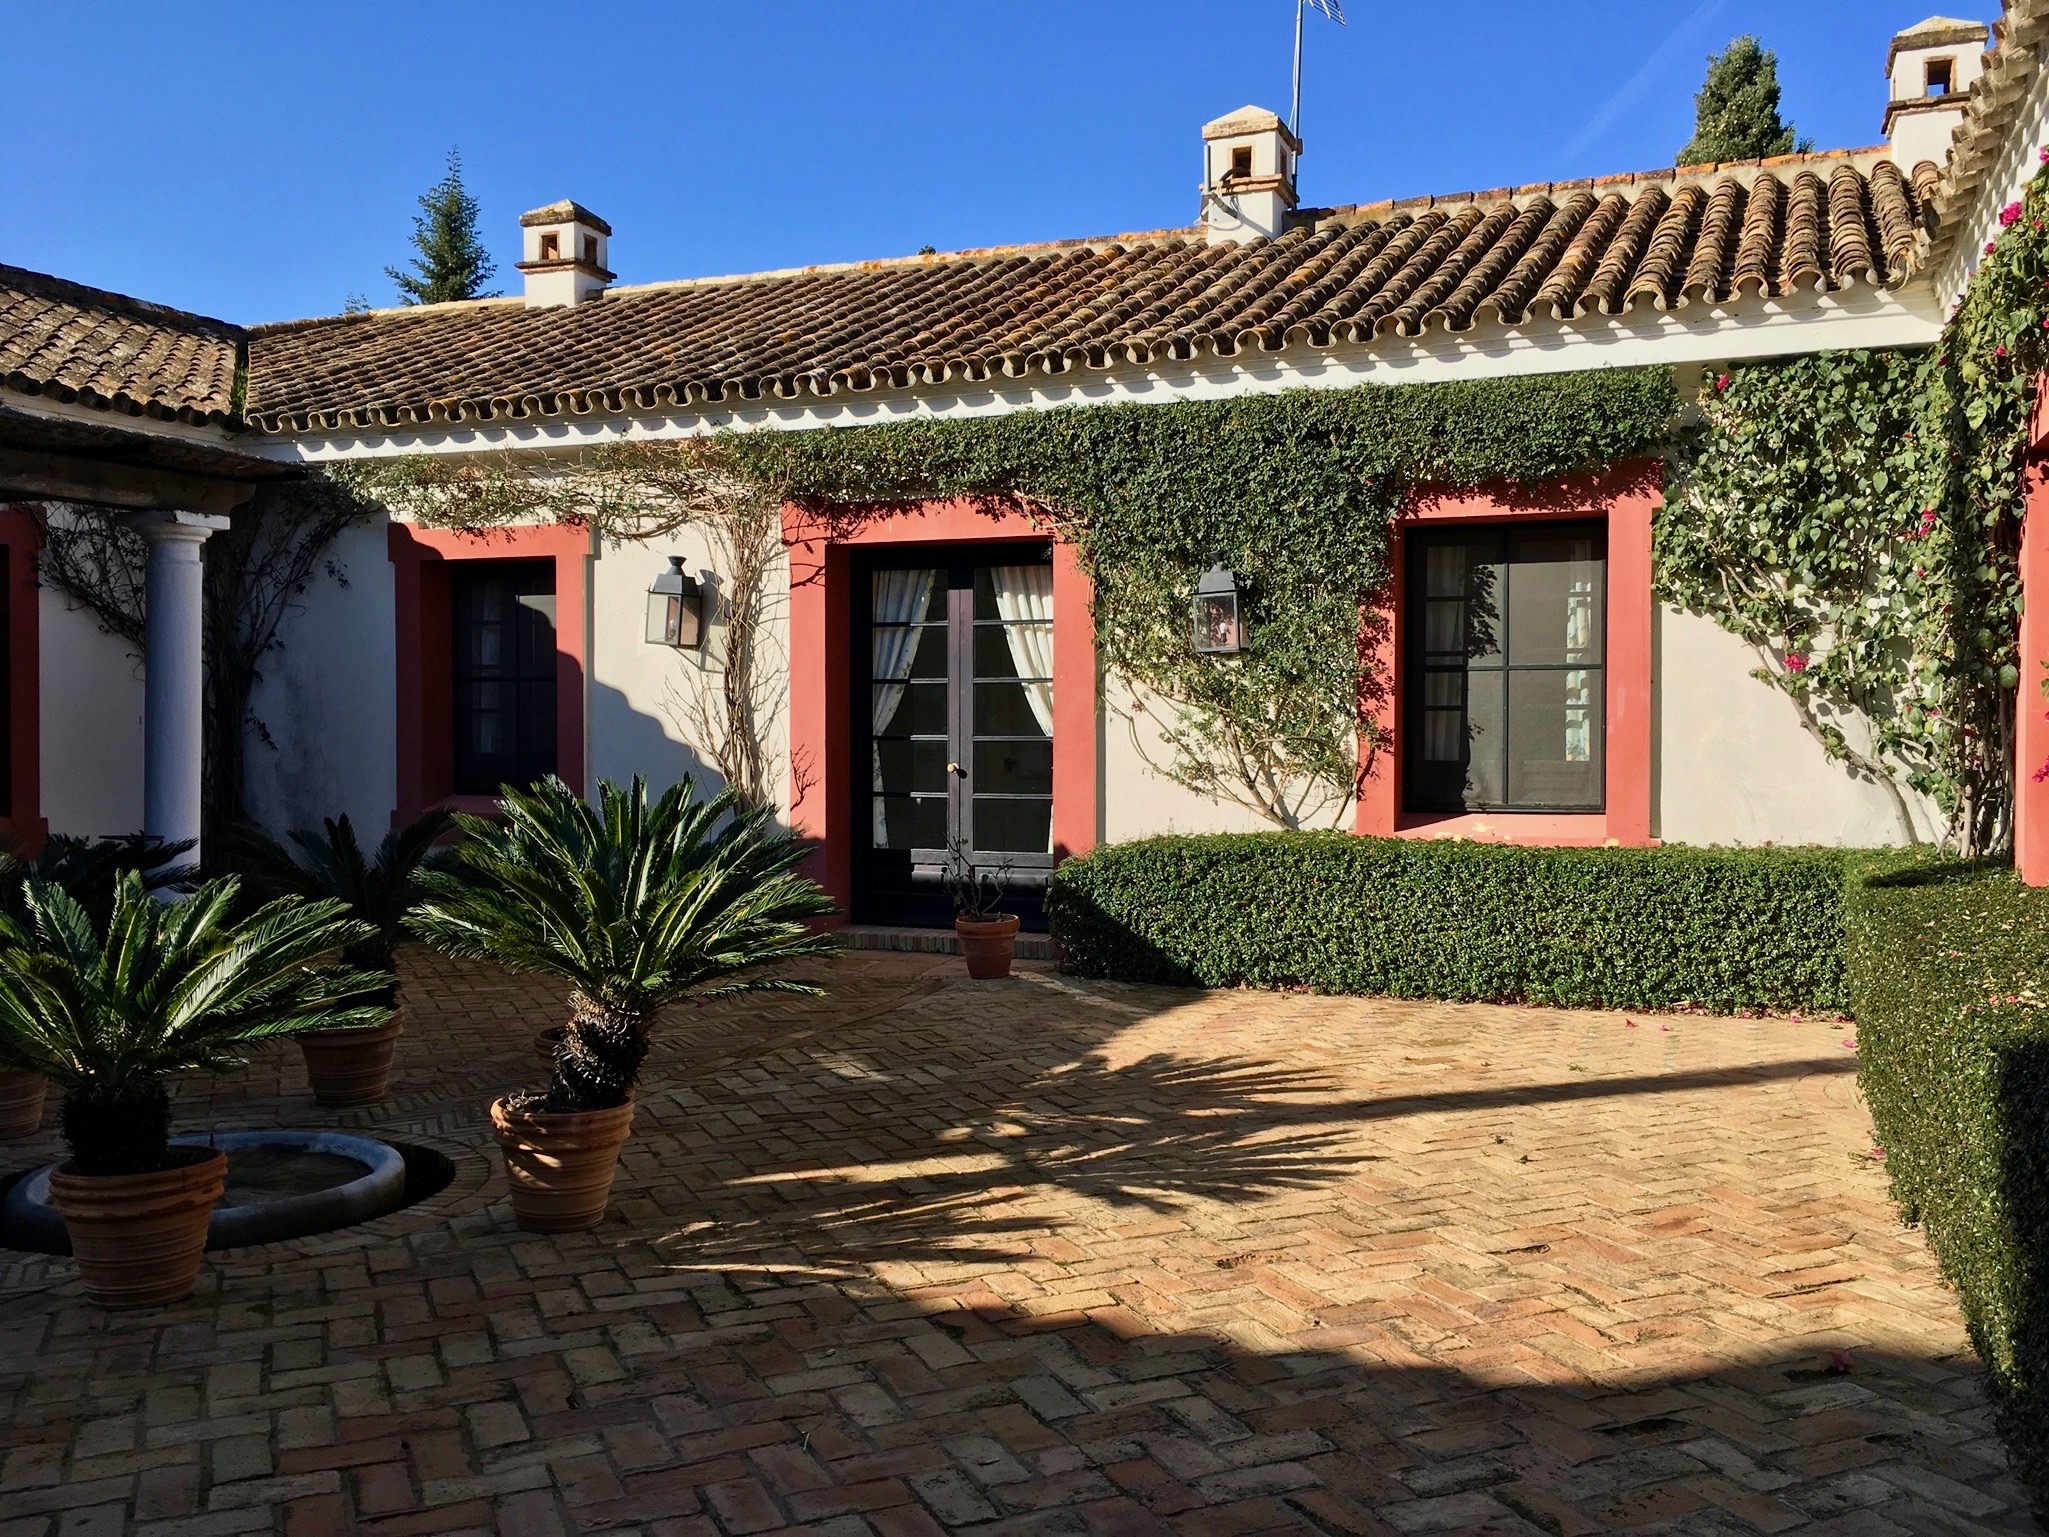 Experience-retreats-Yoga-retreat-fitness-retreats-Andalucia-Courtyard3.jpg